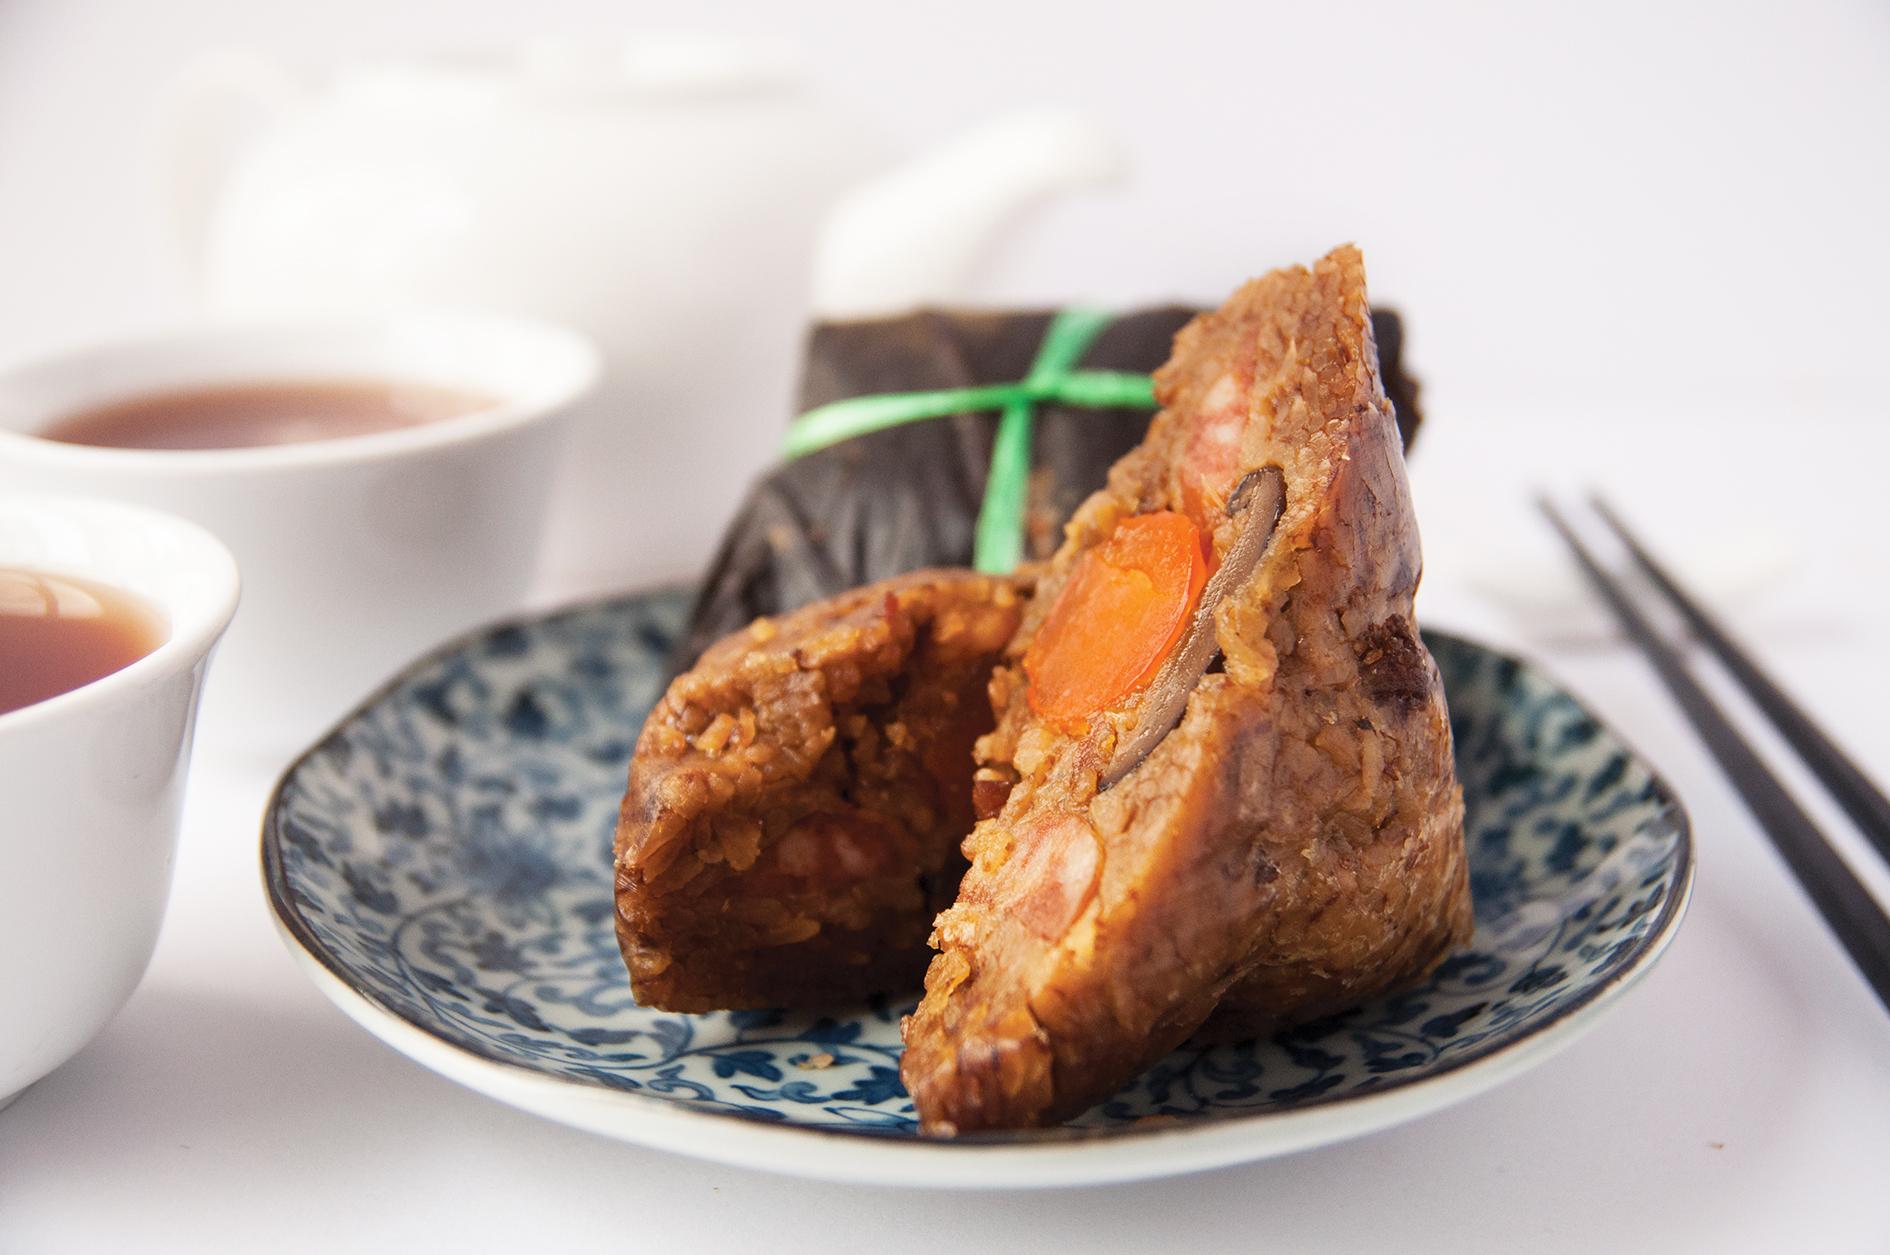 Chicken with Salted Egg Yolk and Chestnut Dumpling (咸蛋黄栗子鸡肉炒米粽)  S$12.65 nett (Takeaway) or S$11.80++ (Dine-in)